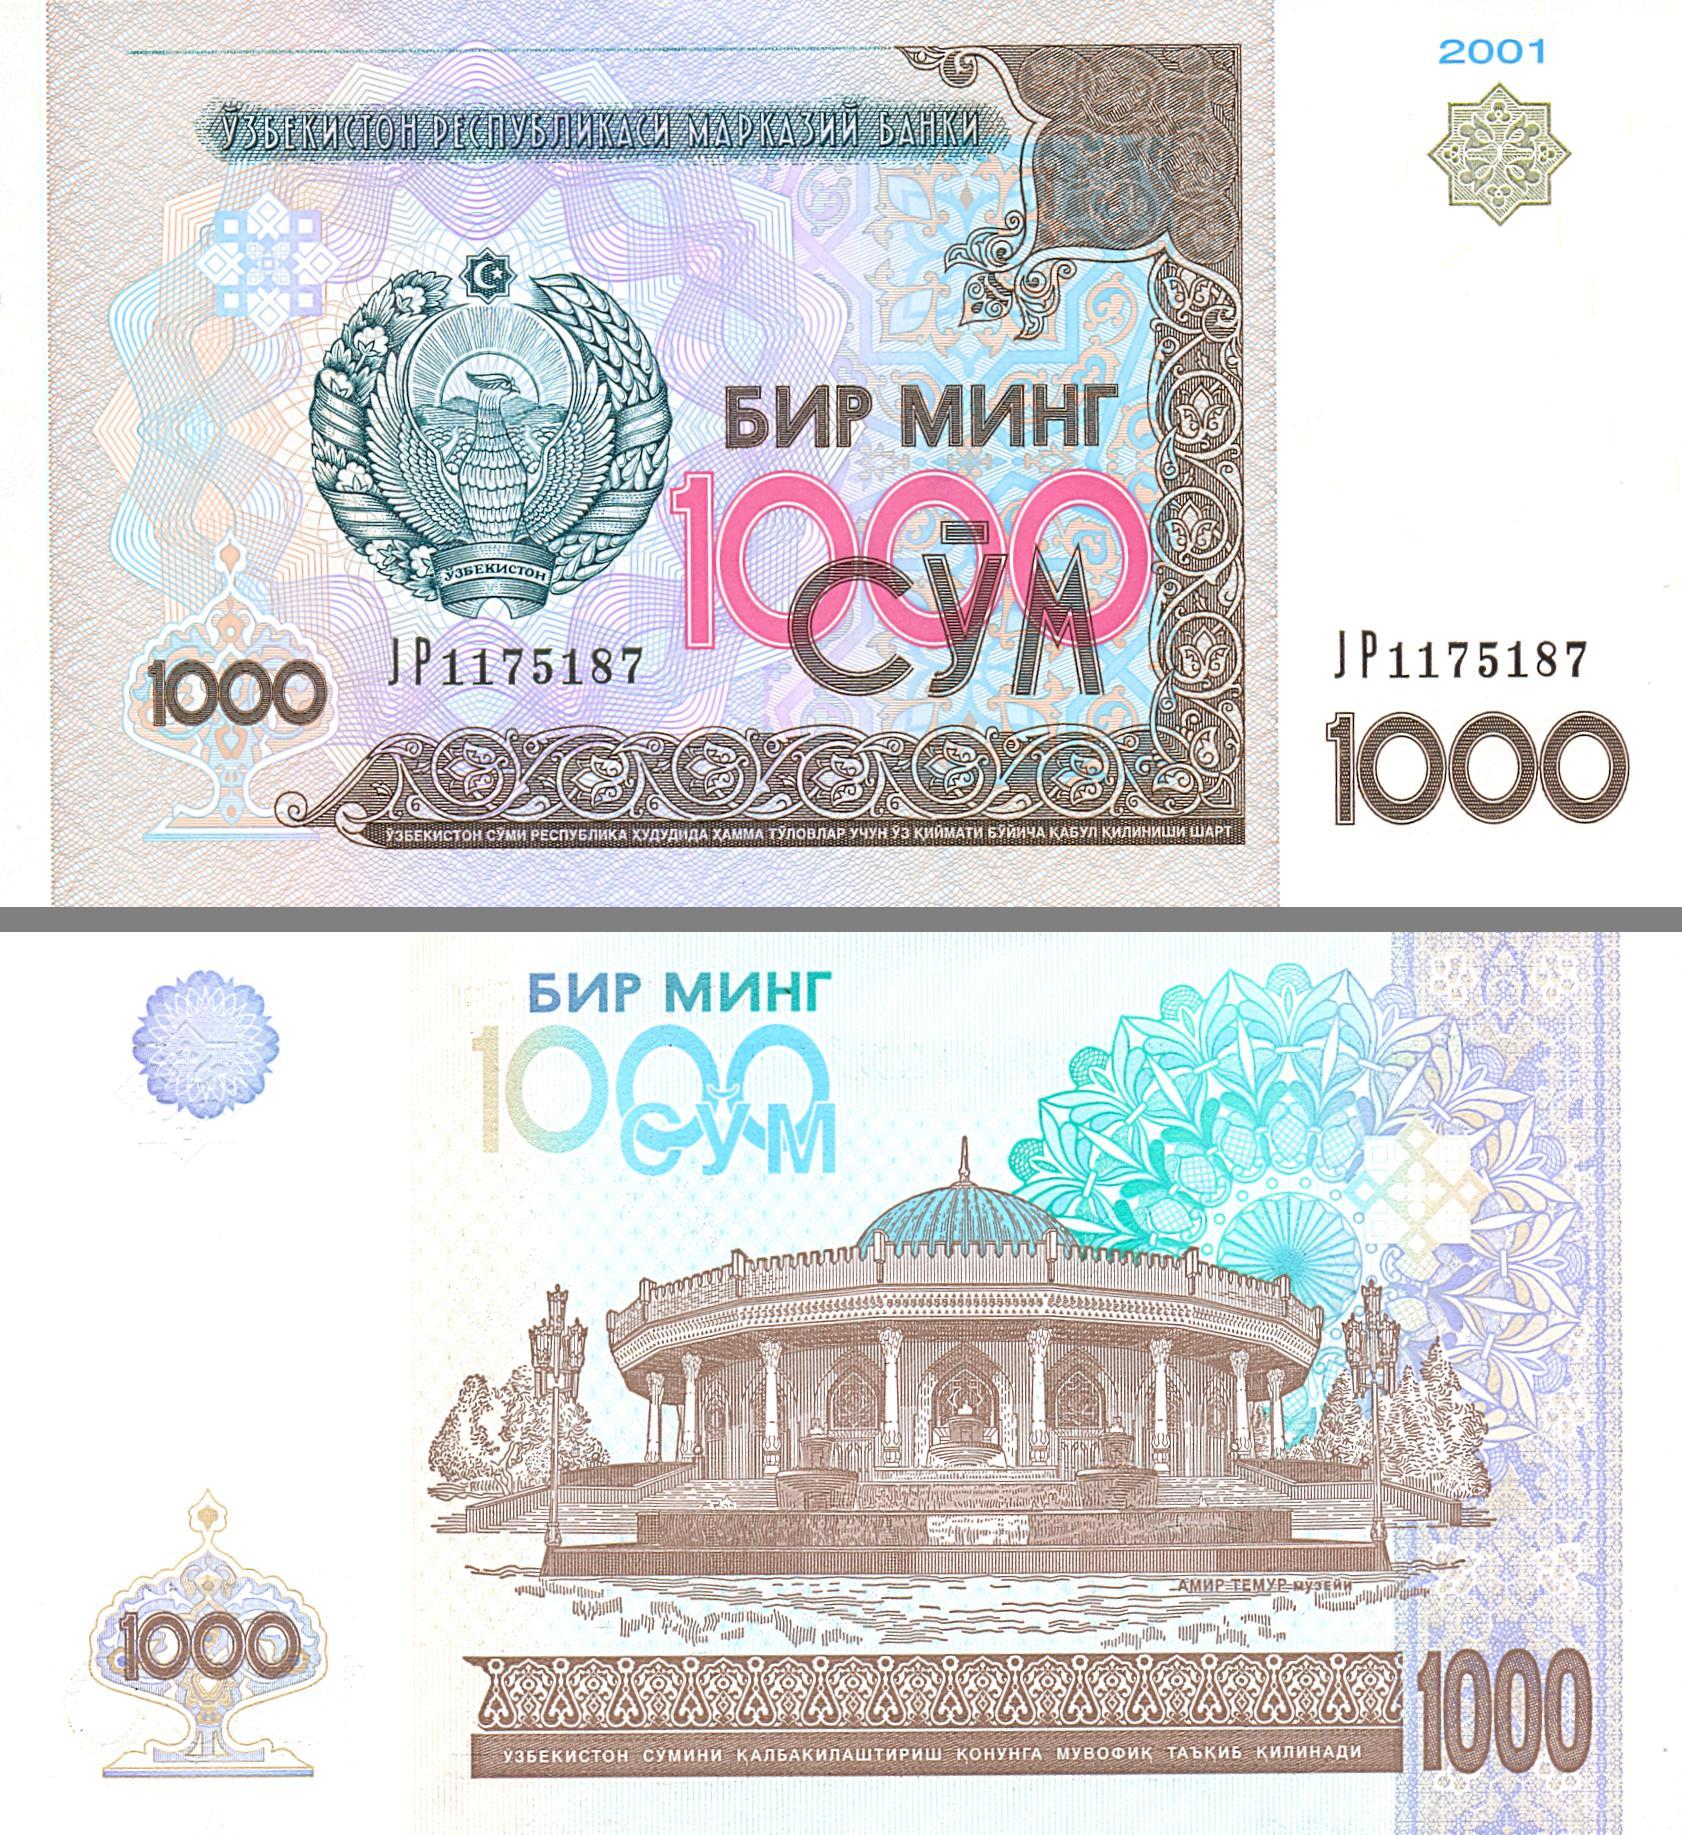 1000UZBEK01.JPG